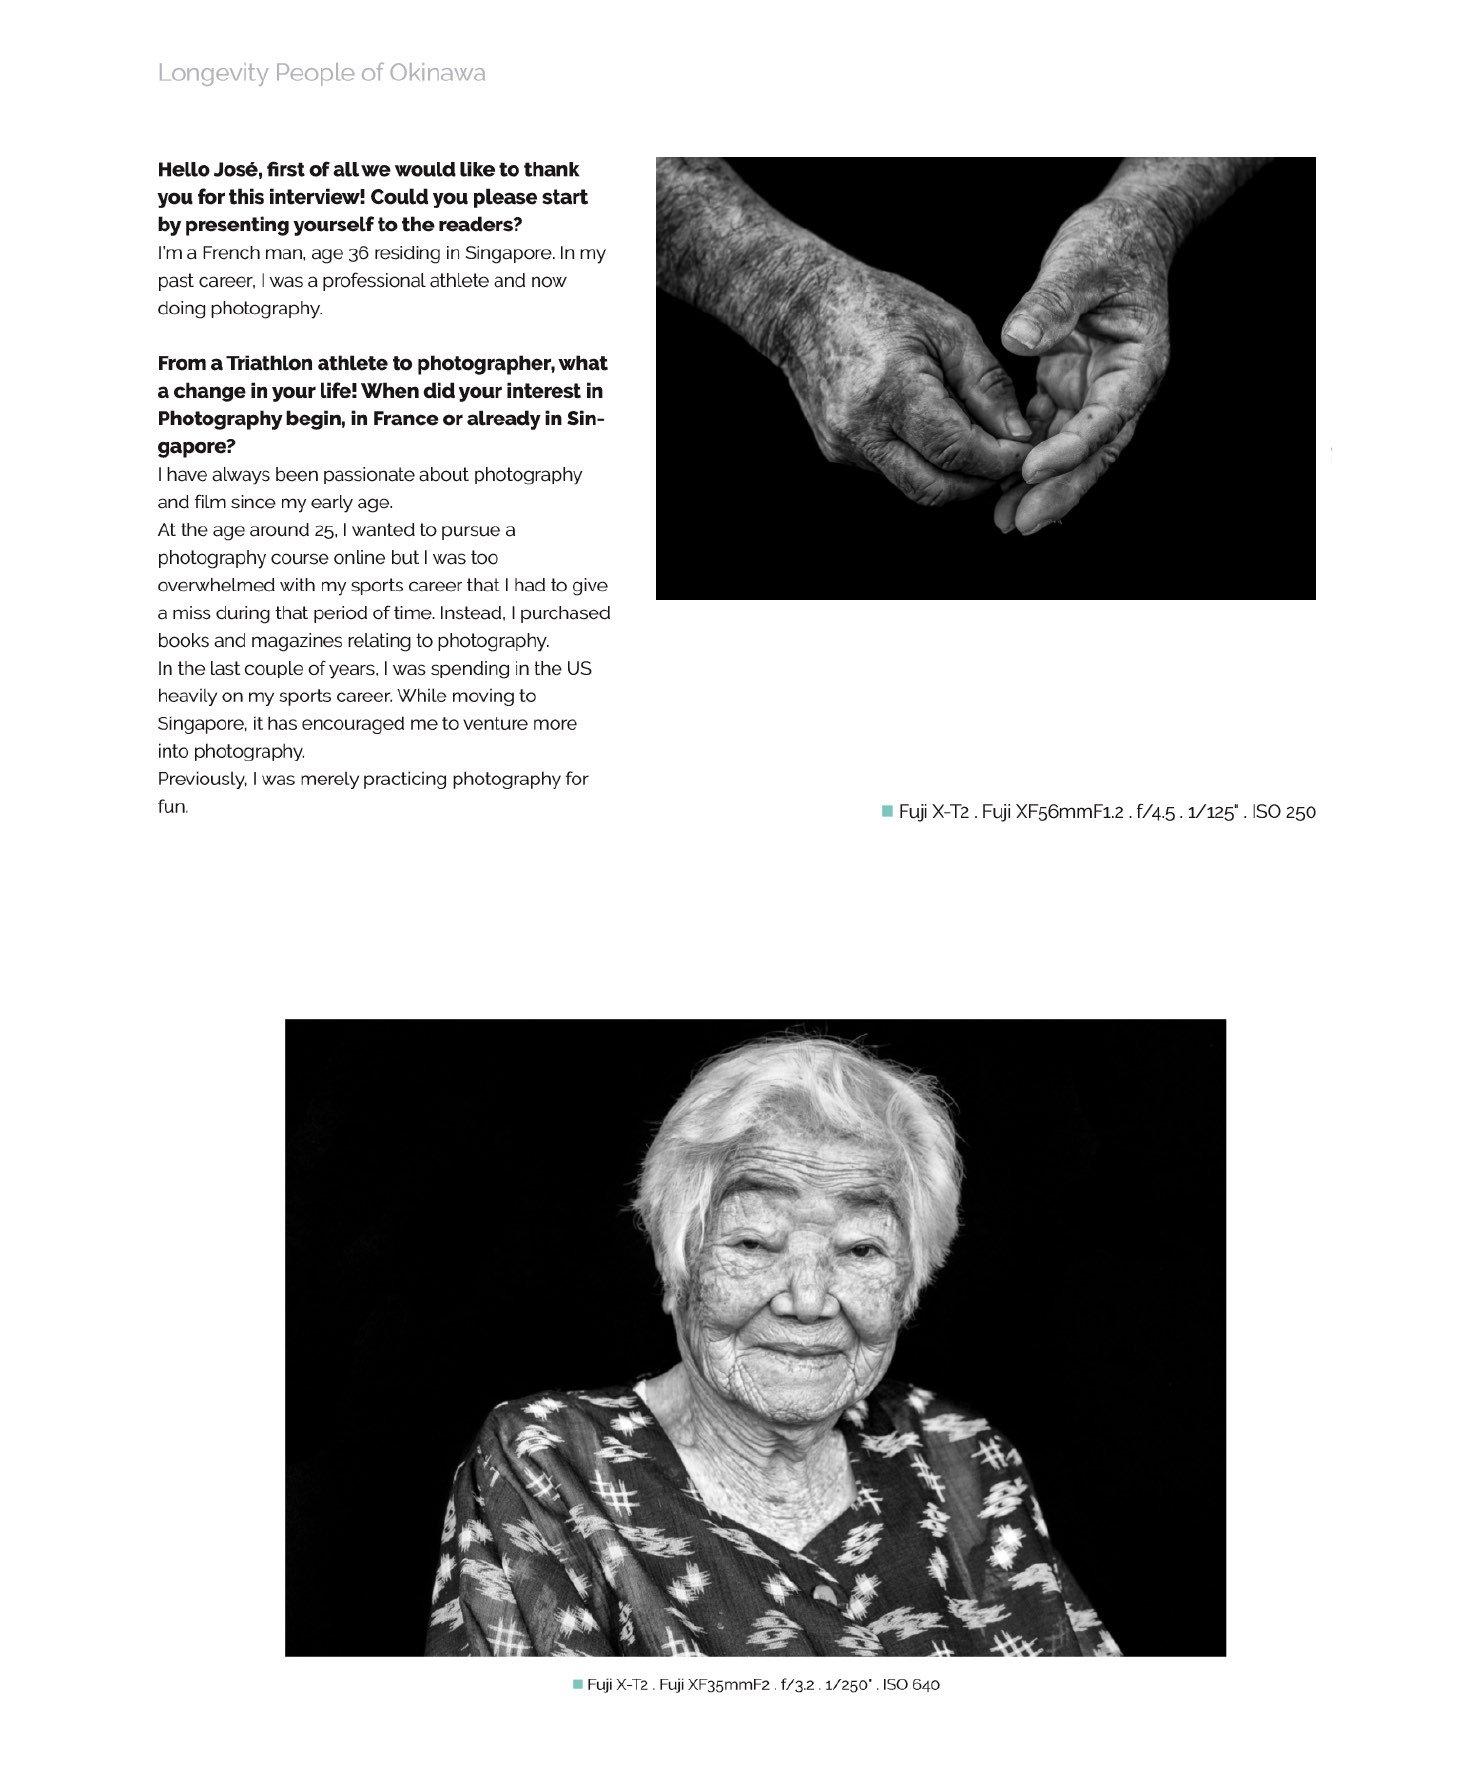 FUJI X Passion Longevity Okinawa Jose Jeuland 3